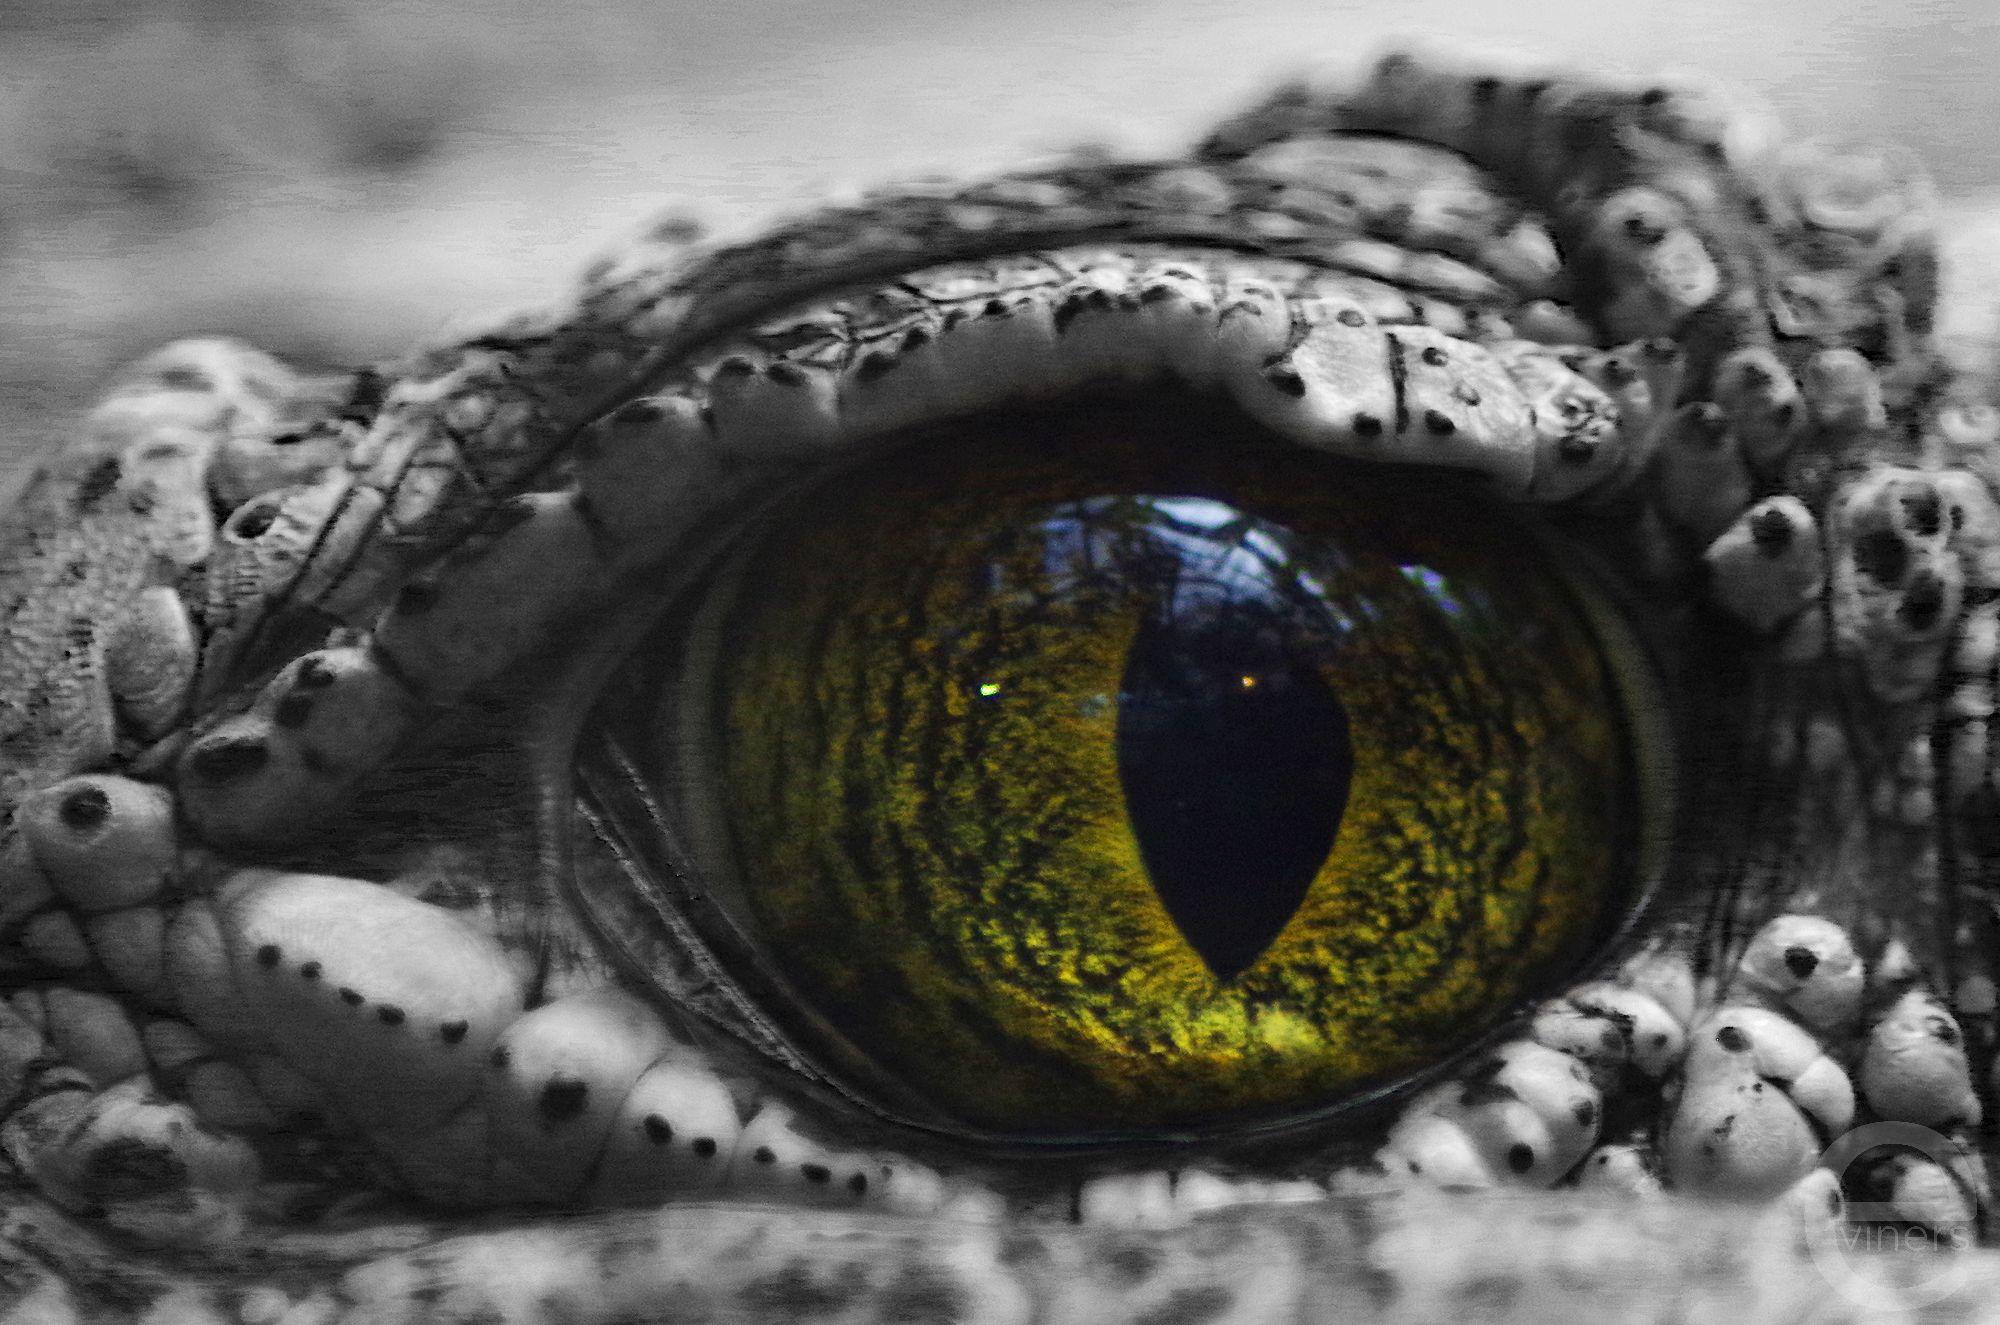 Eye of a Crocodile